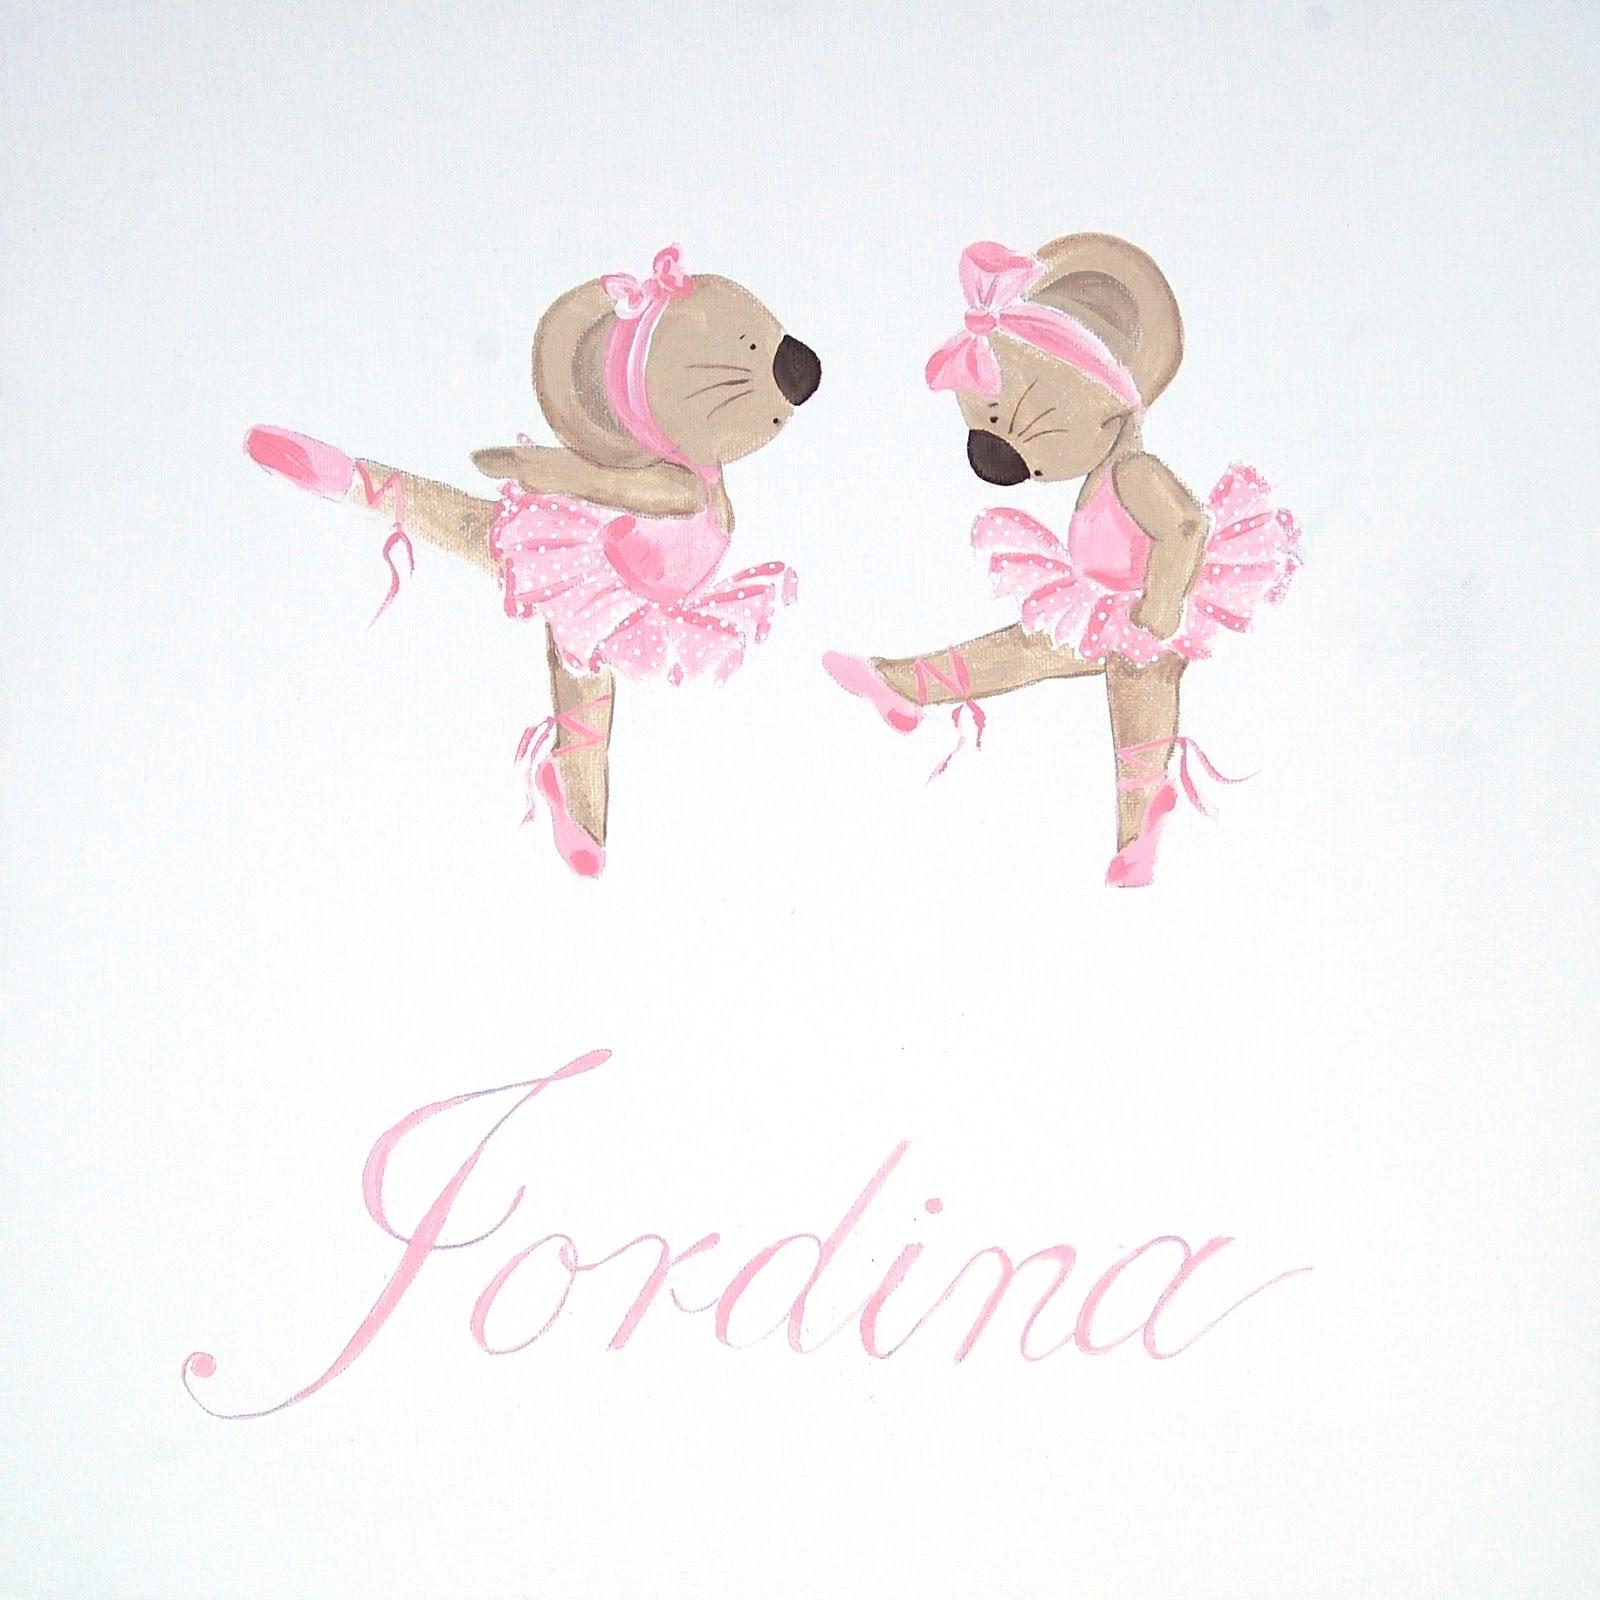 Illusions d 39 enfants ratoncitas bailarinas - Cuadros bailarinas infantiles ...